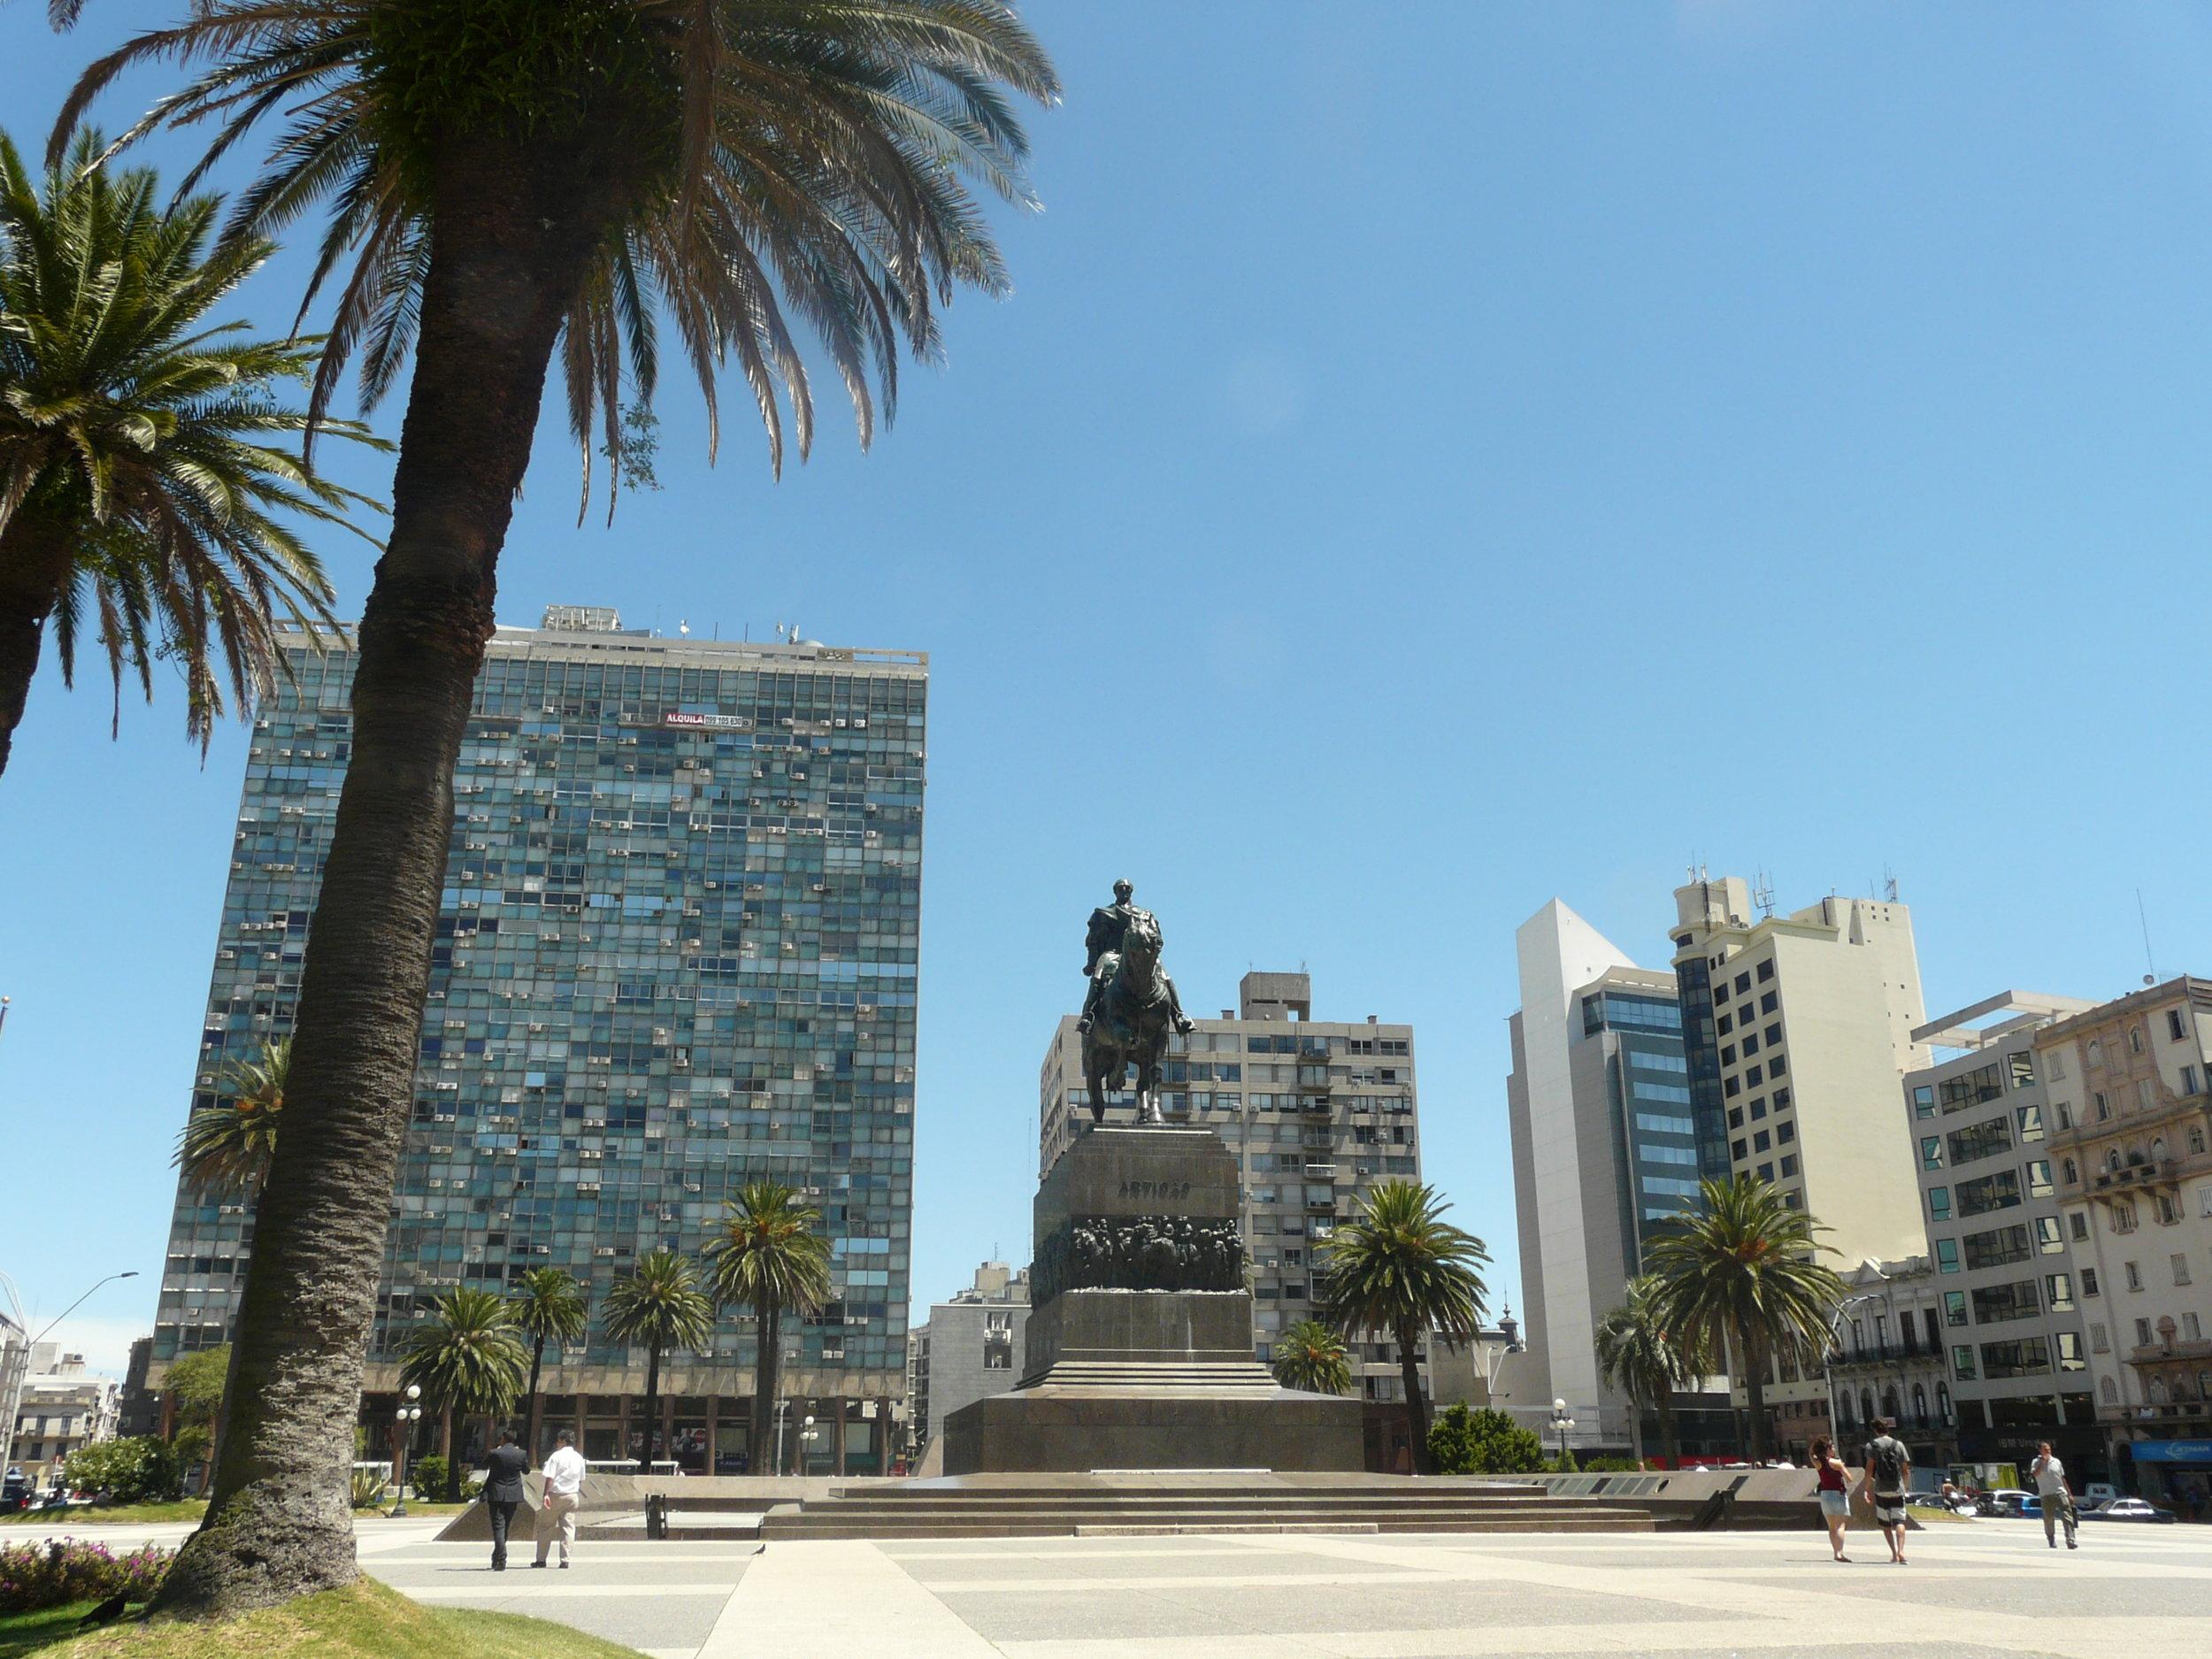 stock-photo-monumento-a-artigas-plaza-independencia-104134399.jpg